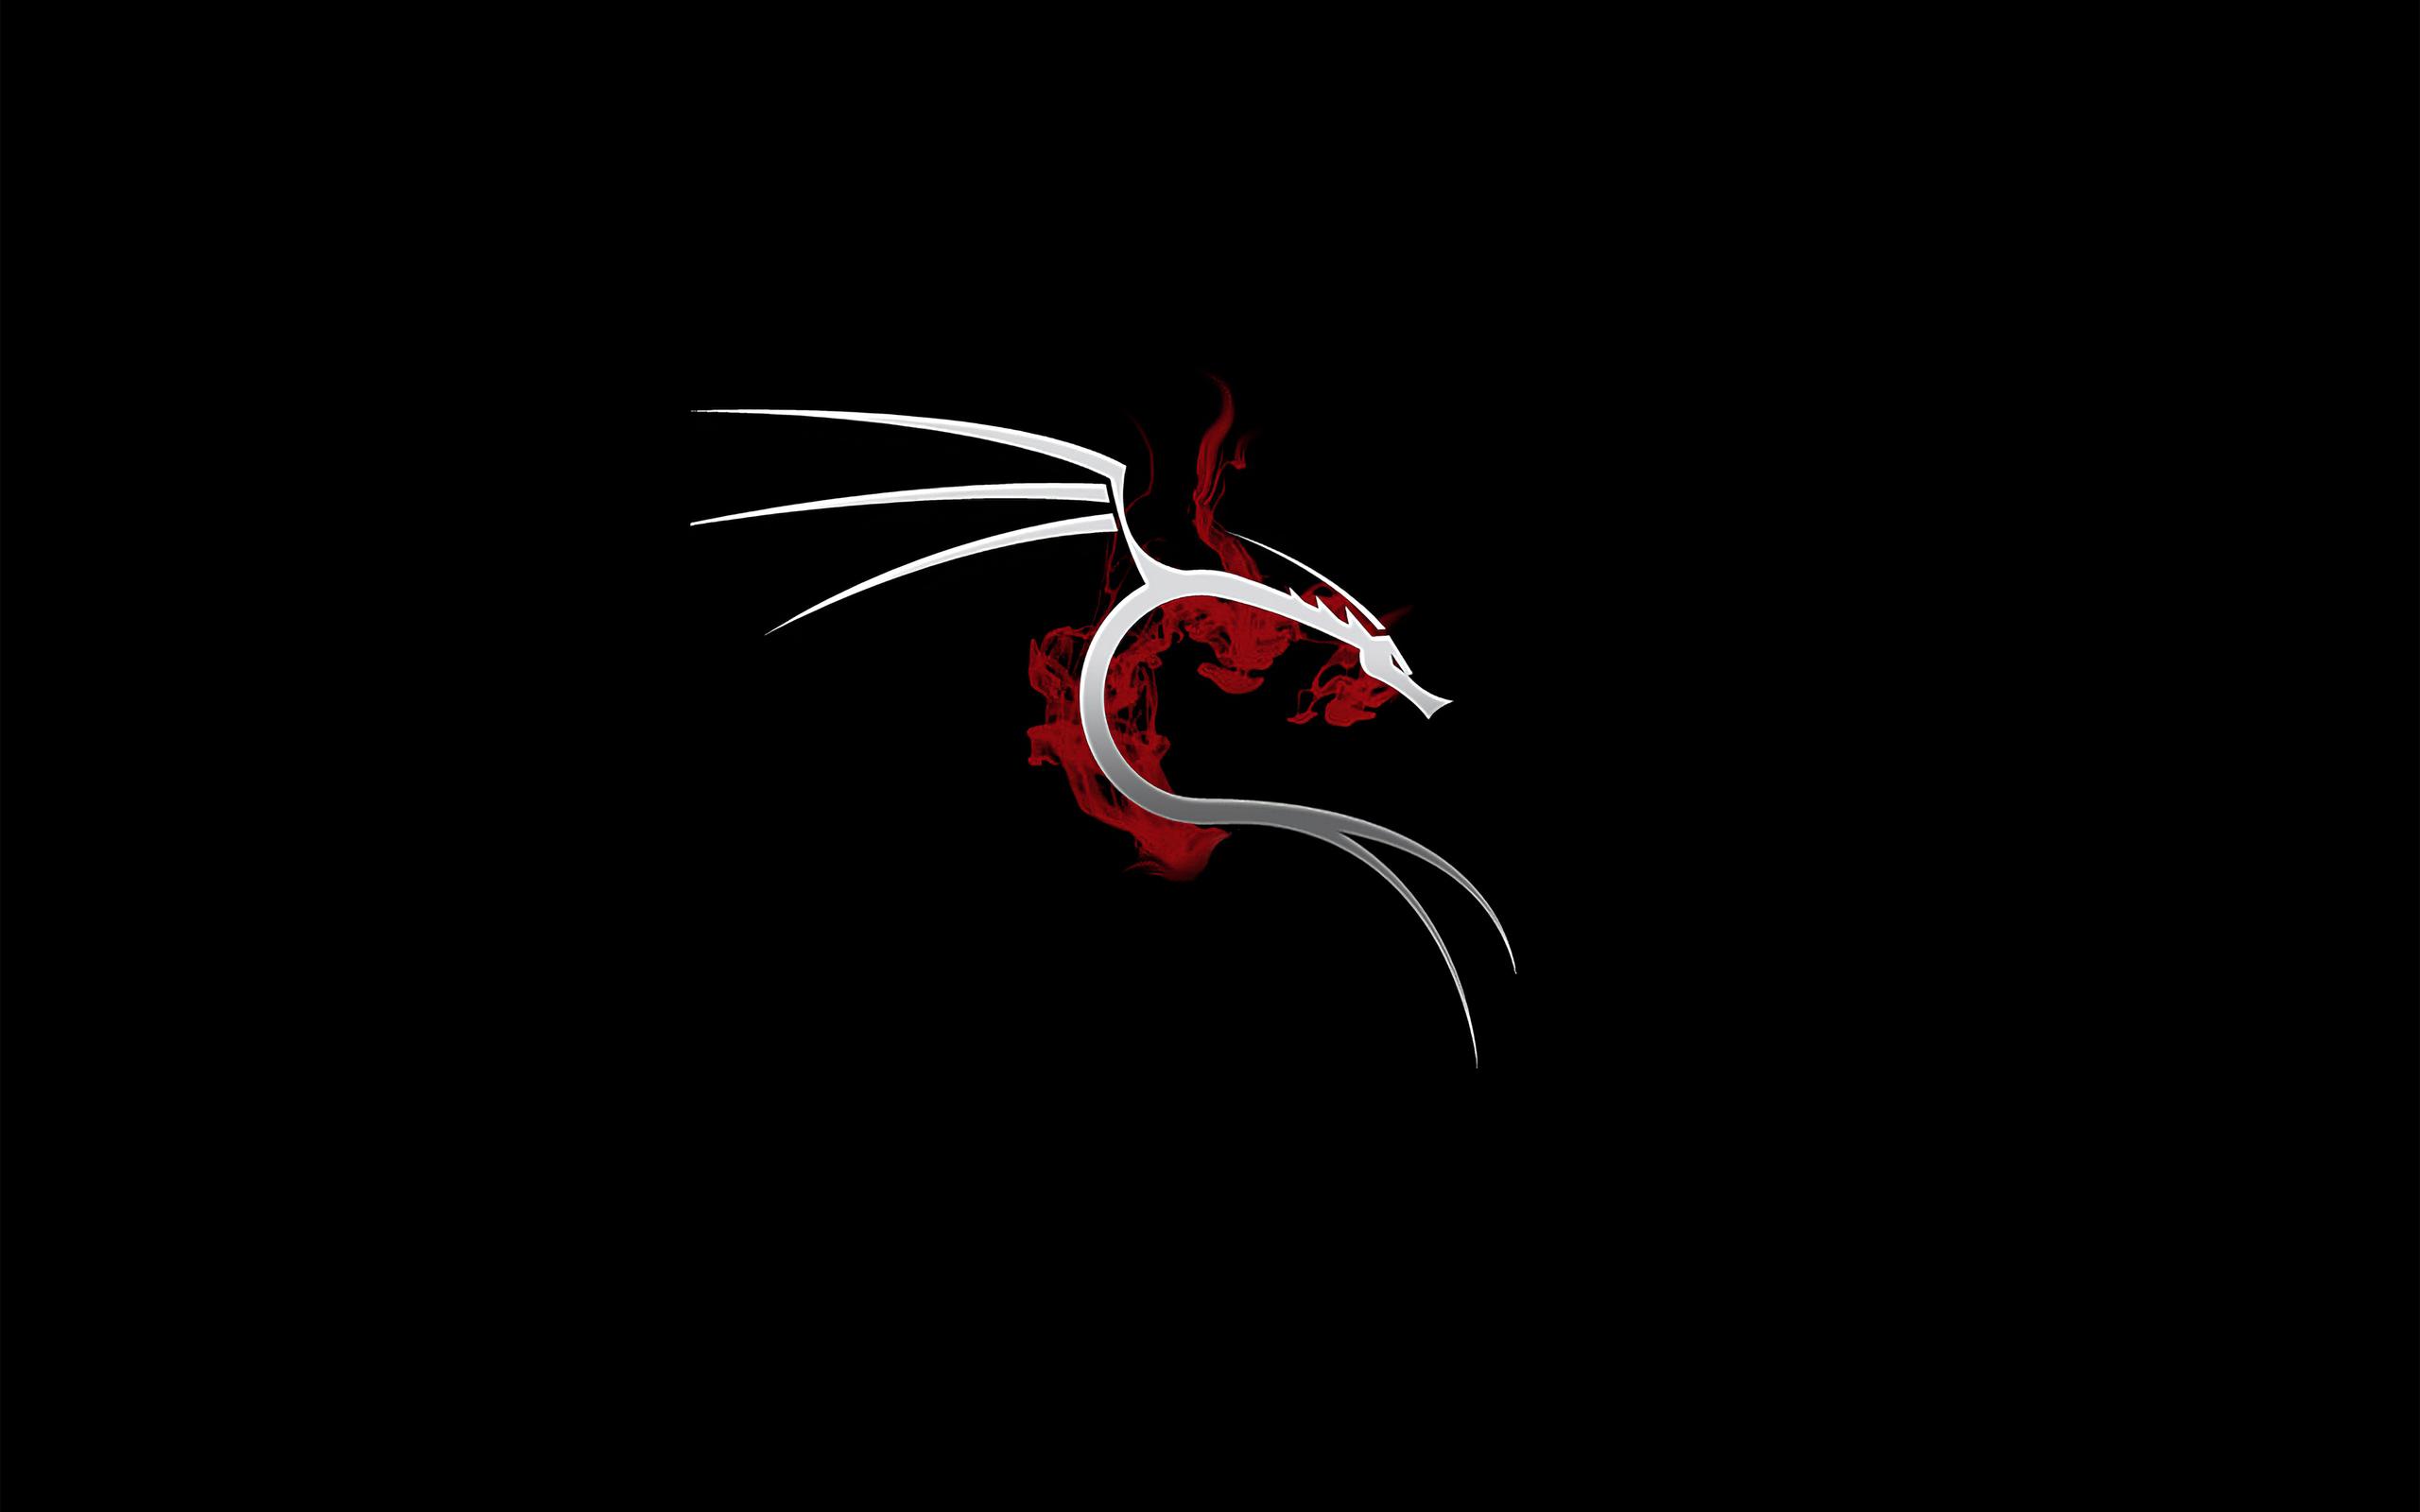 kali-linux-4k-pm.jpg